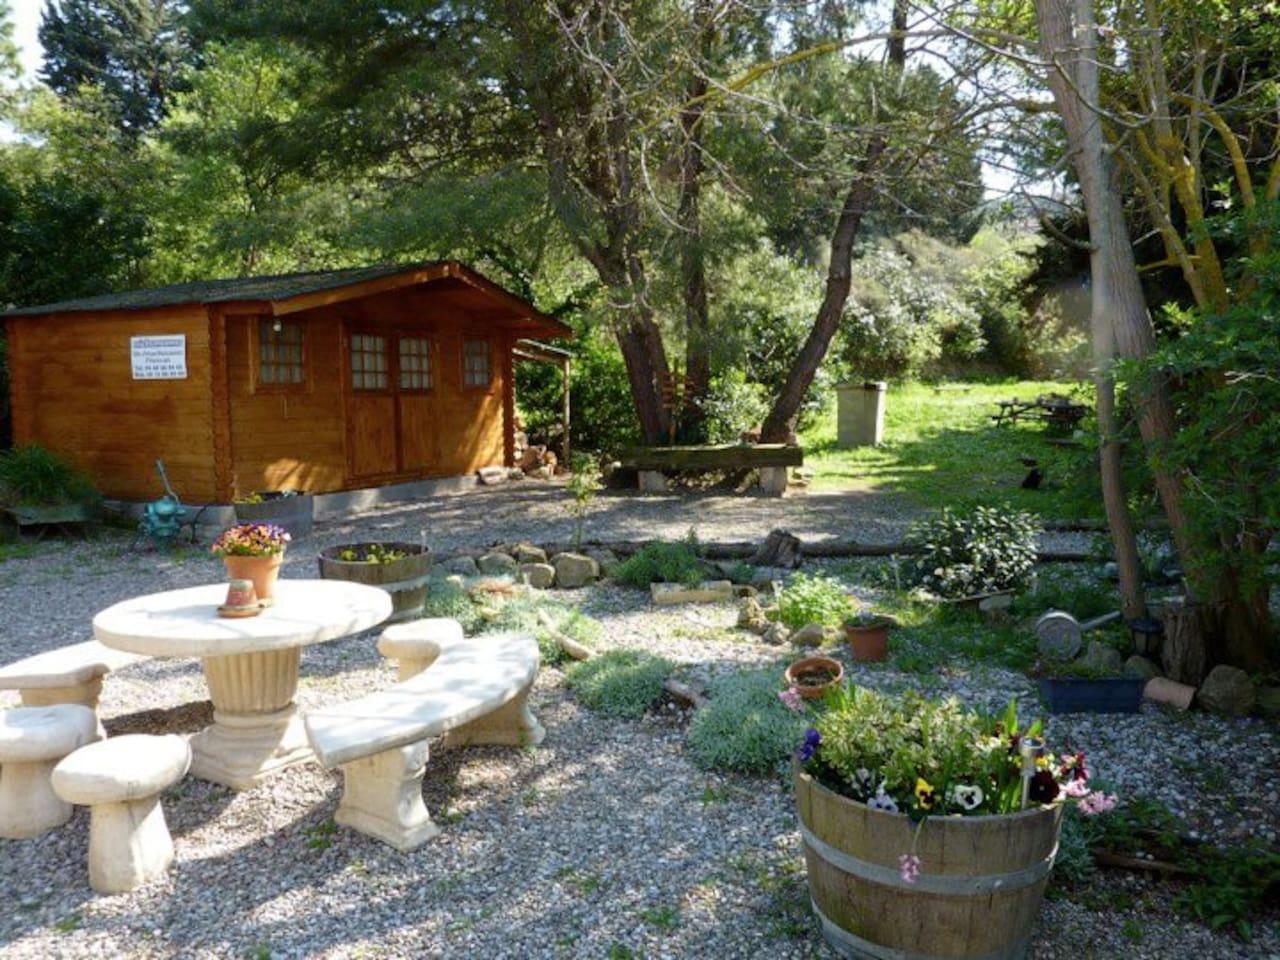 Sidsmums Travellrs Retreat beautiful garden